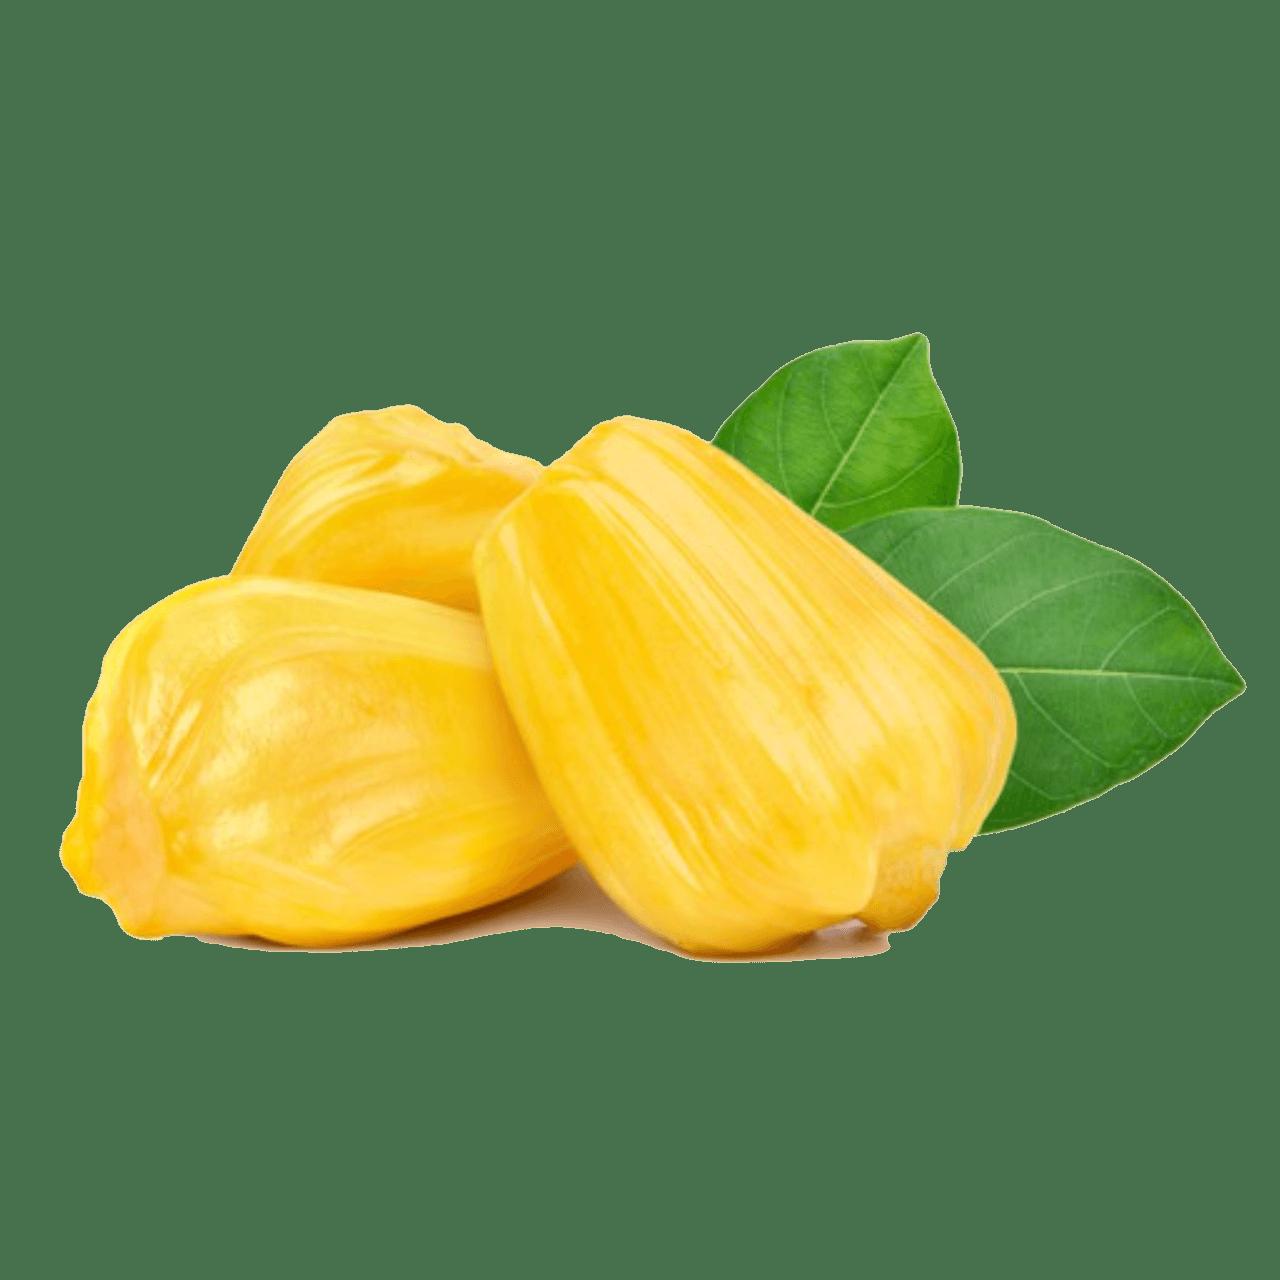 The jackfruit contains 94 calories per 100 grammes